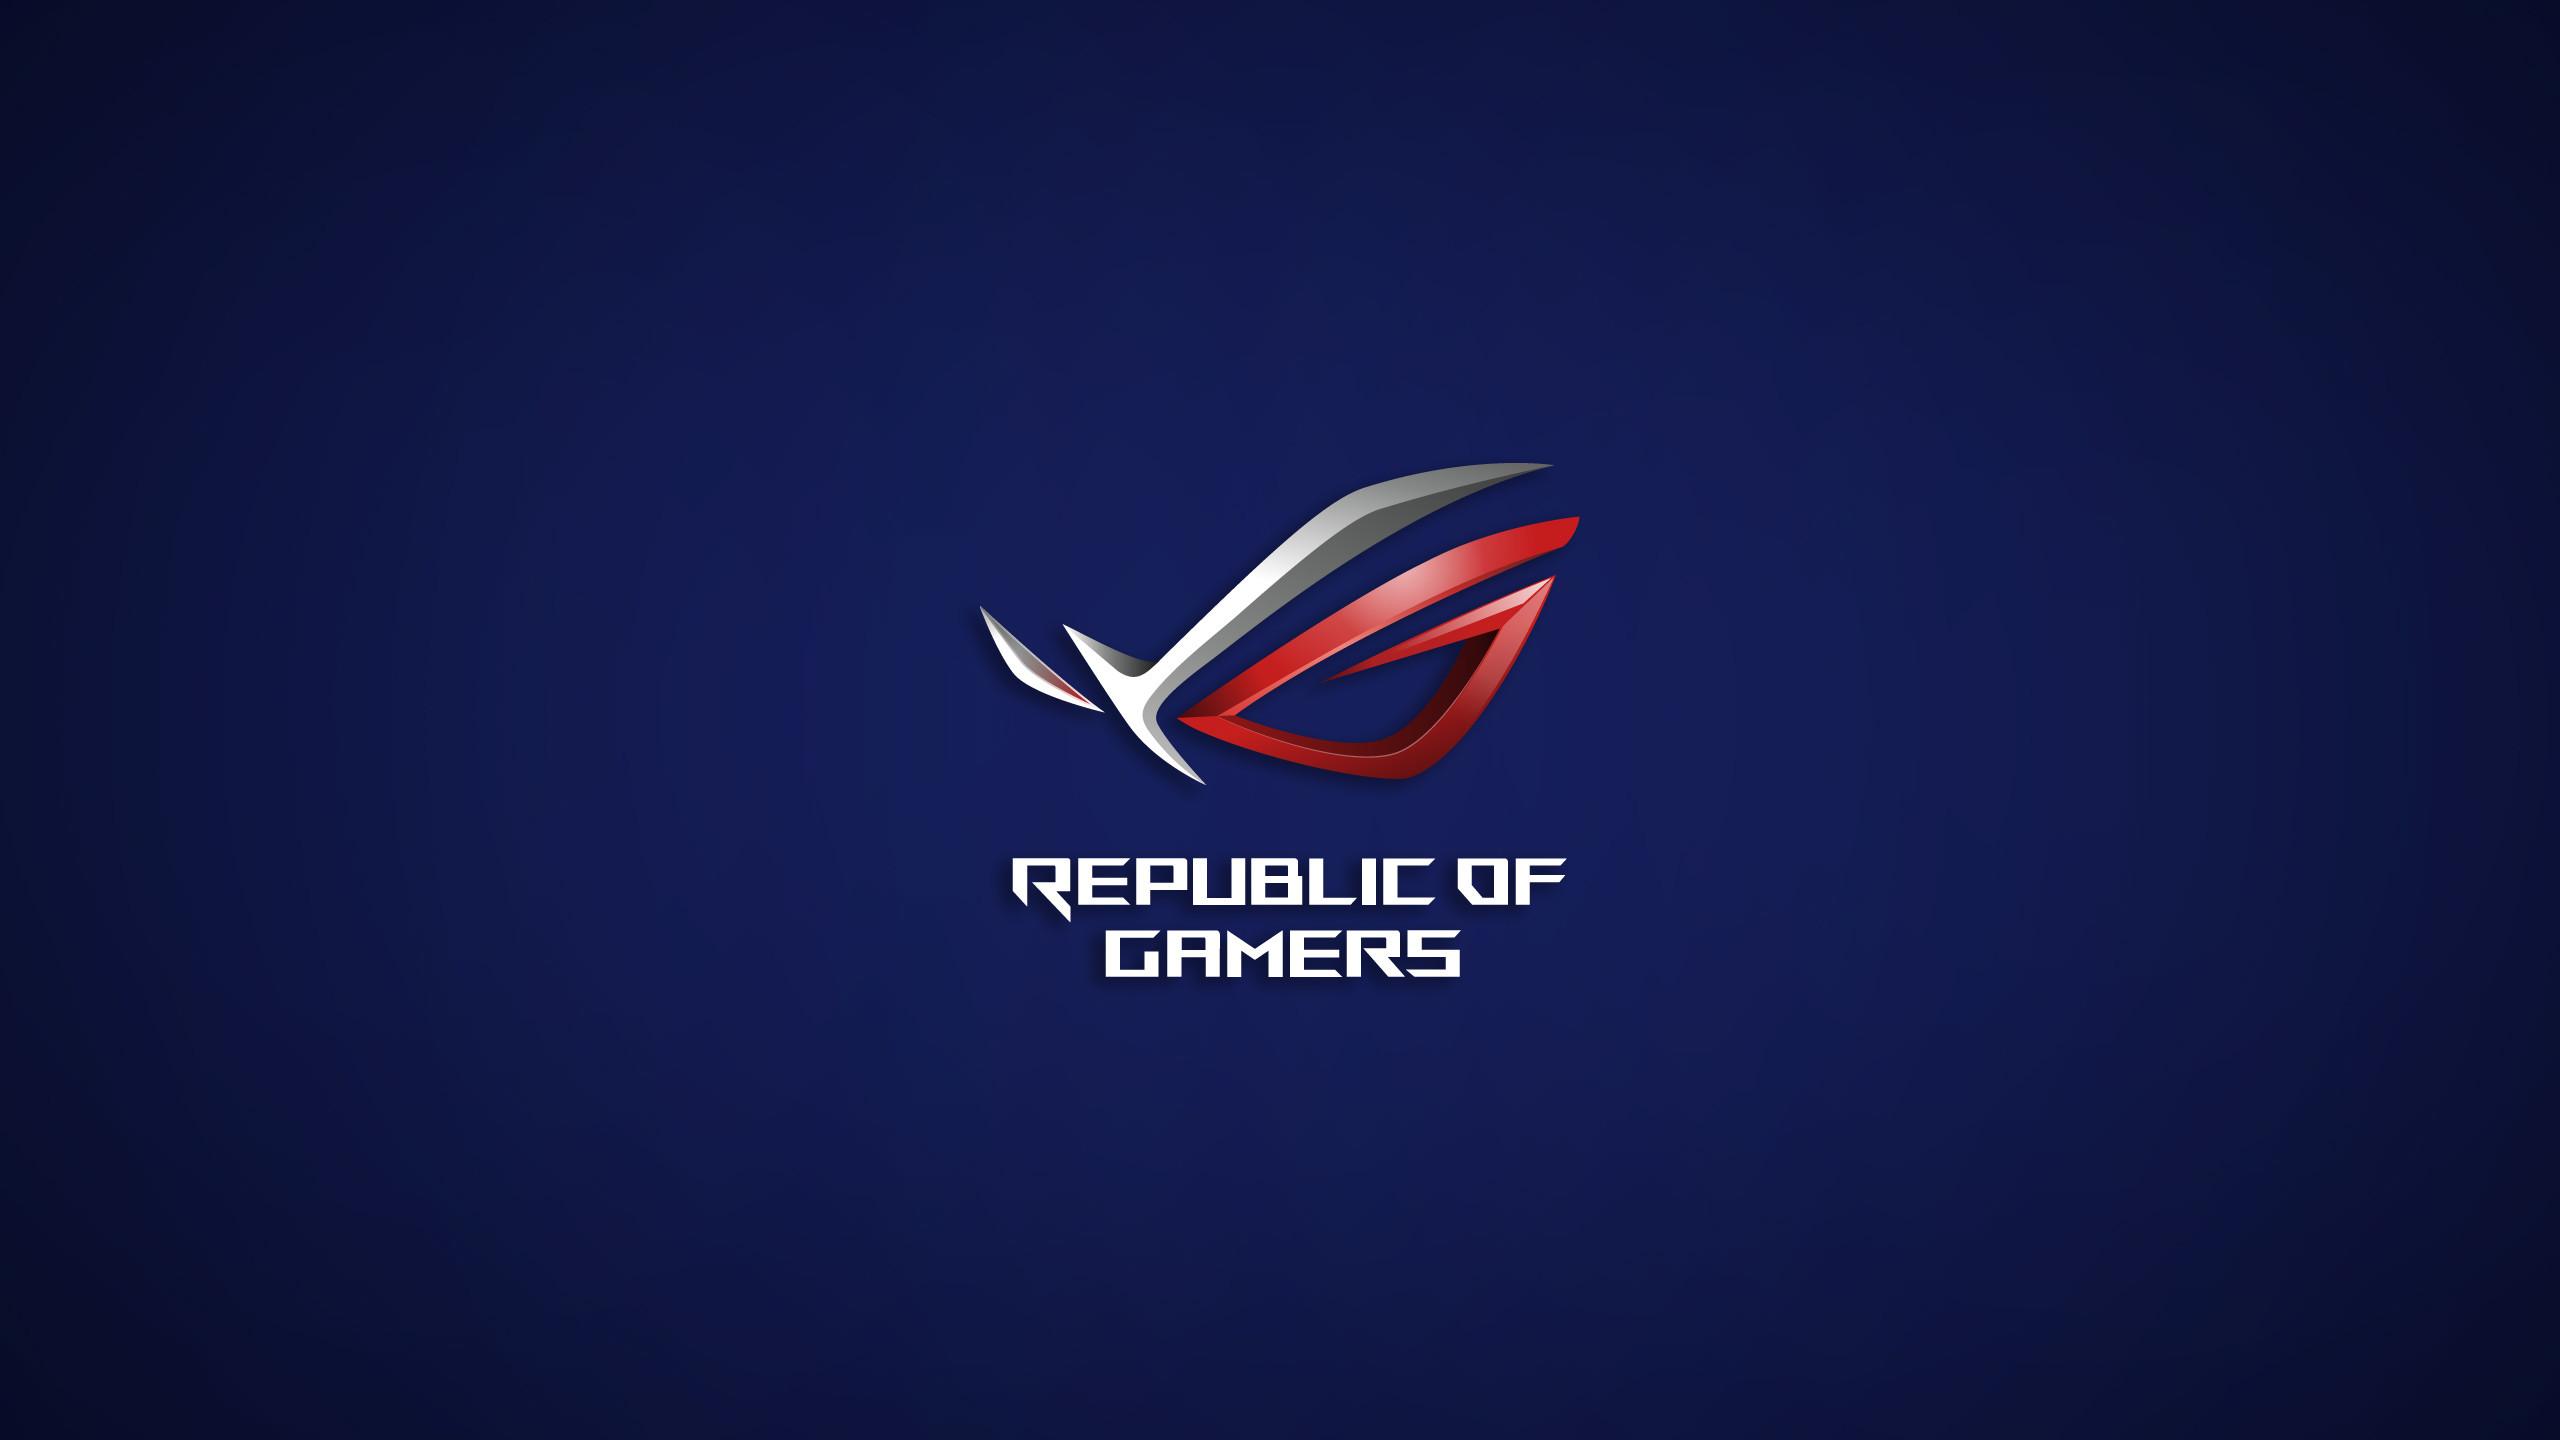 Technology / Republic of Gamers Wallpaper